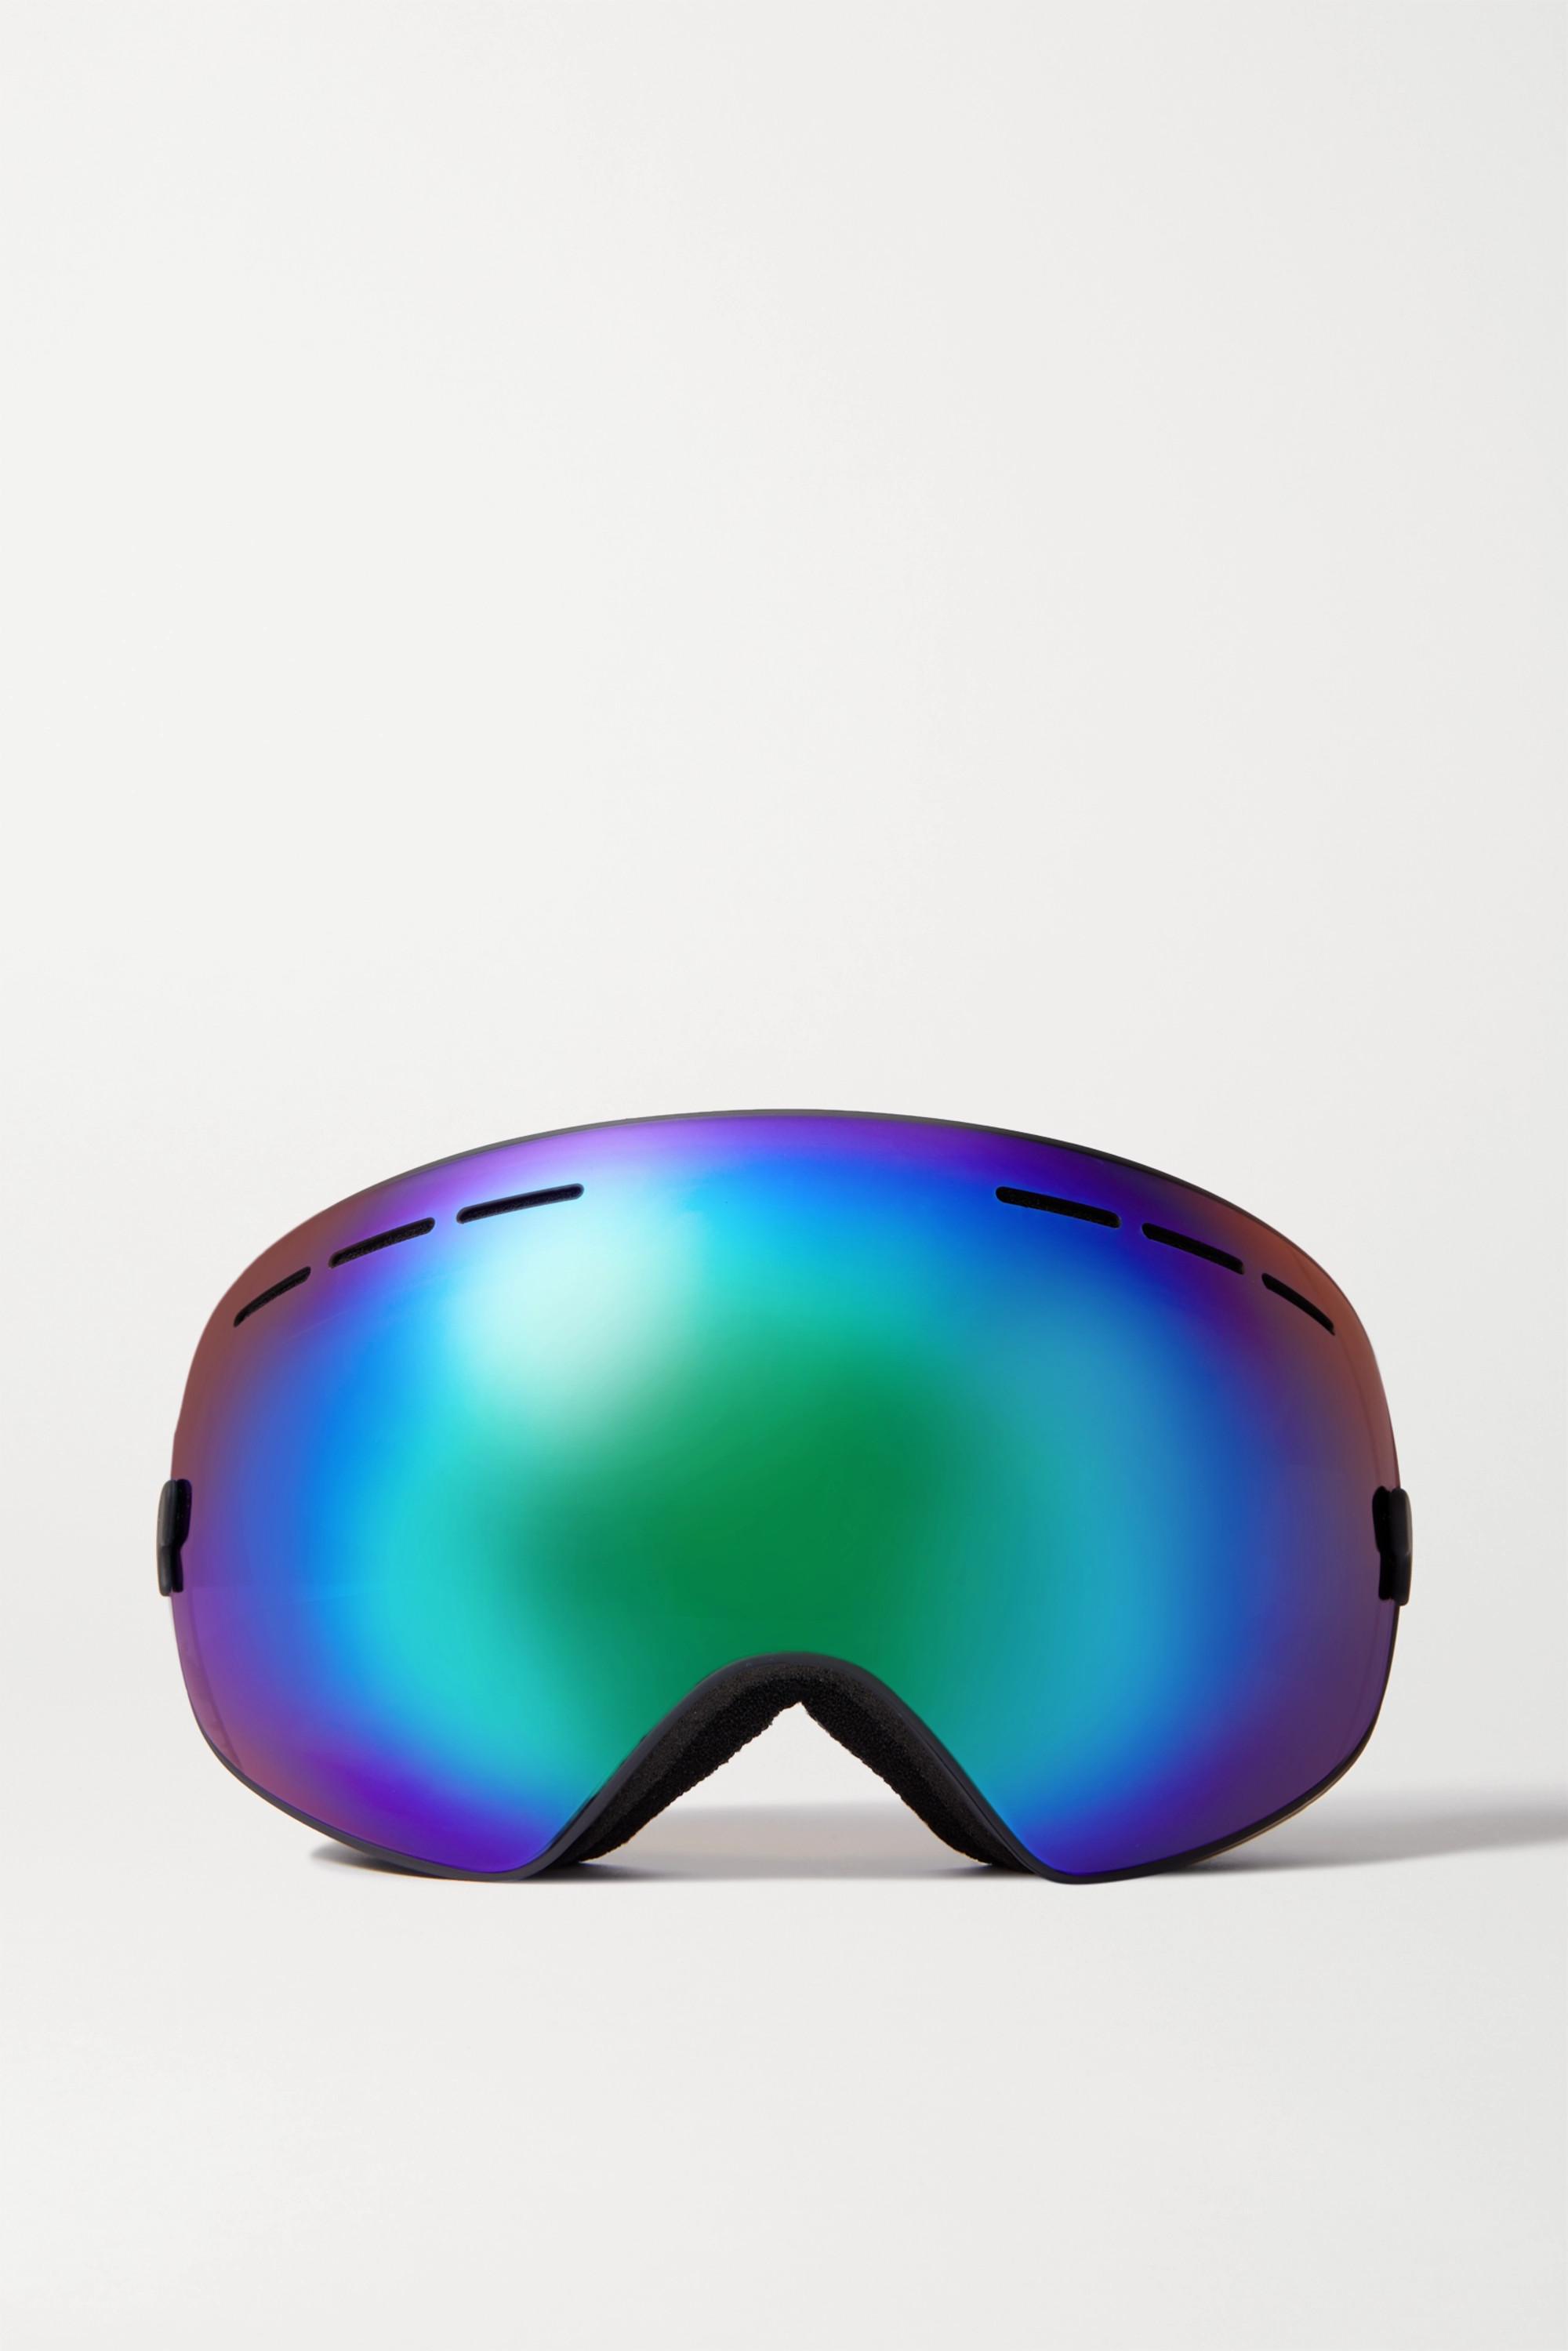 Perfect Moment Mountain Mission mirrored ski goggles